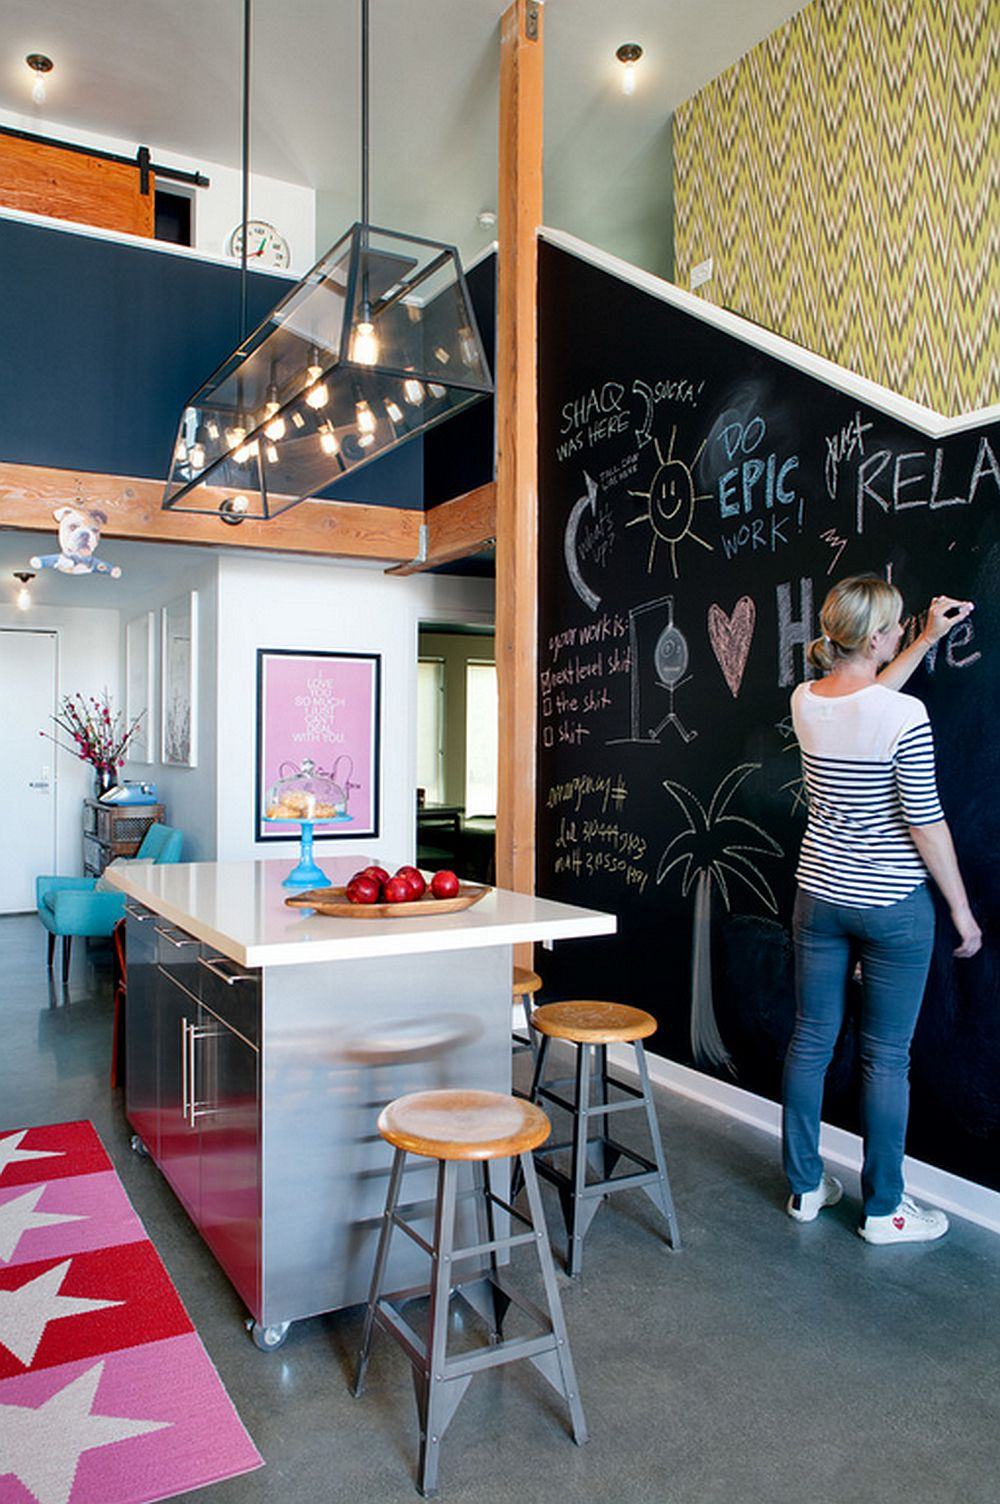 adelaparvu.com despre loft urban, design interior Daleet Spector, foto Lee Manning (1)